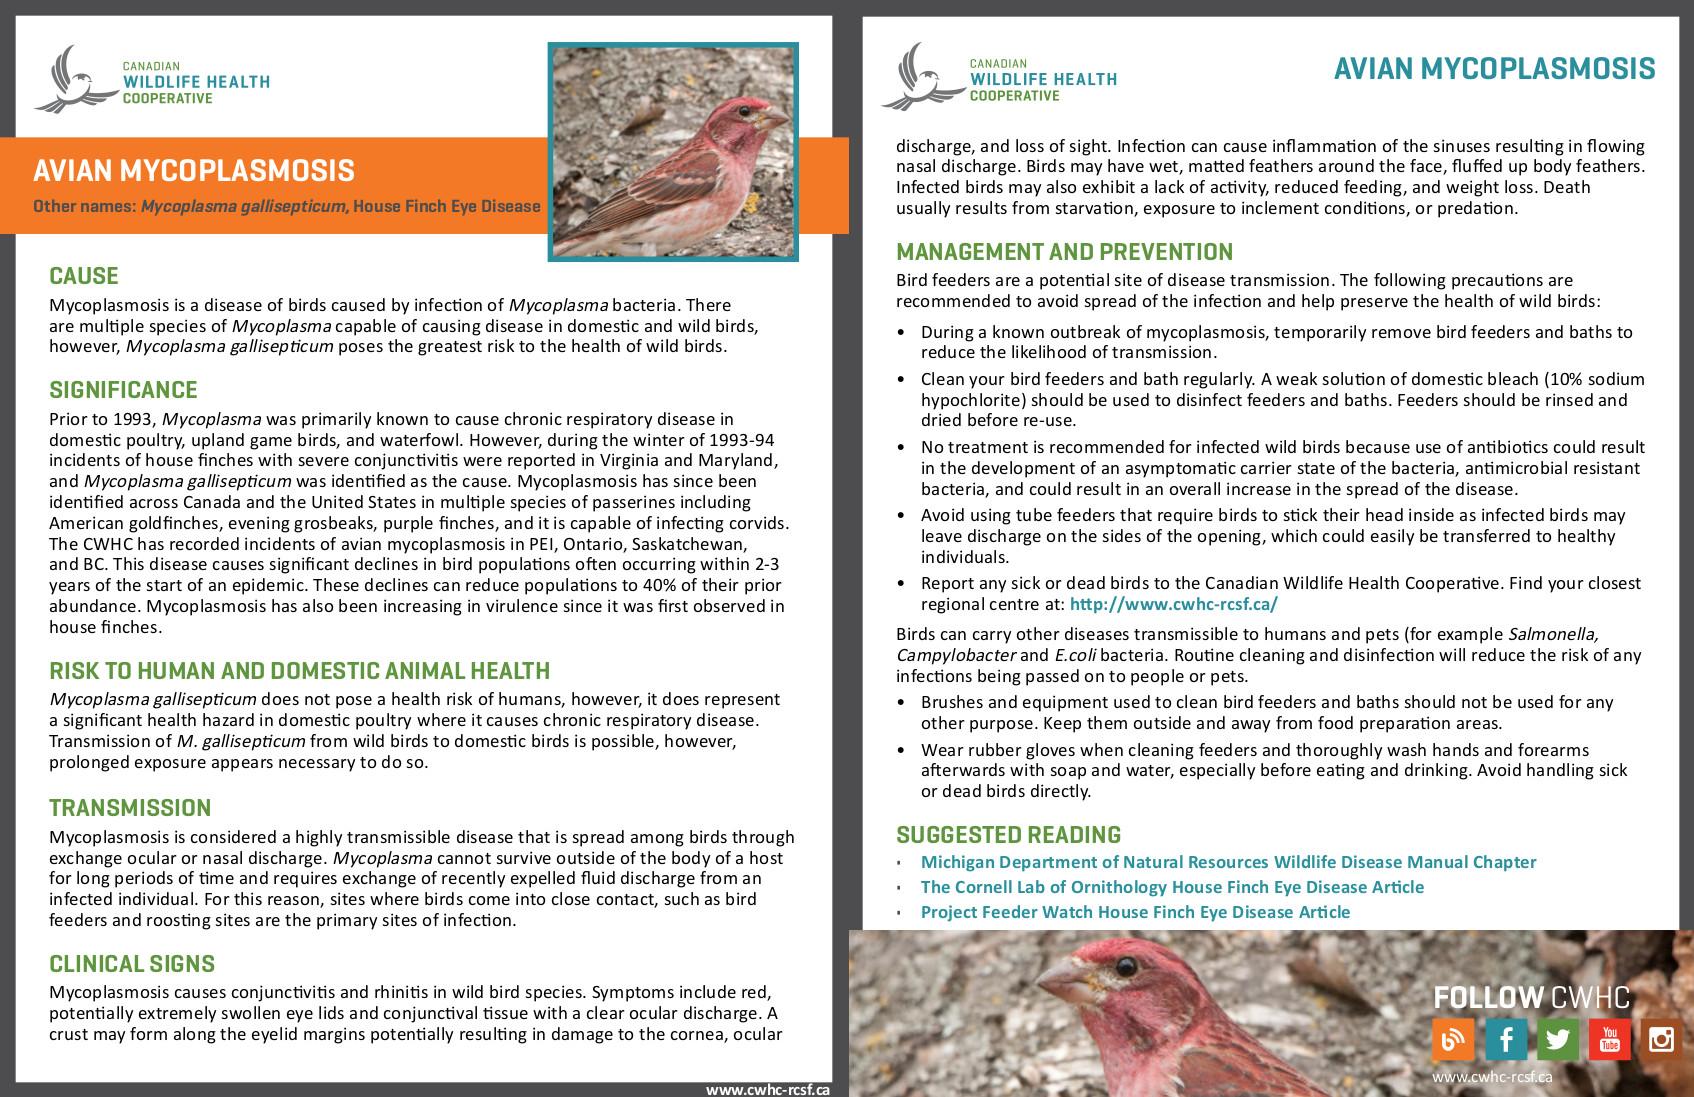 CWHC-RCSF - Canadian Wildlife Health Cooperative / Réseau